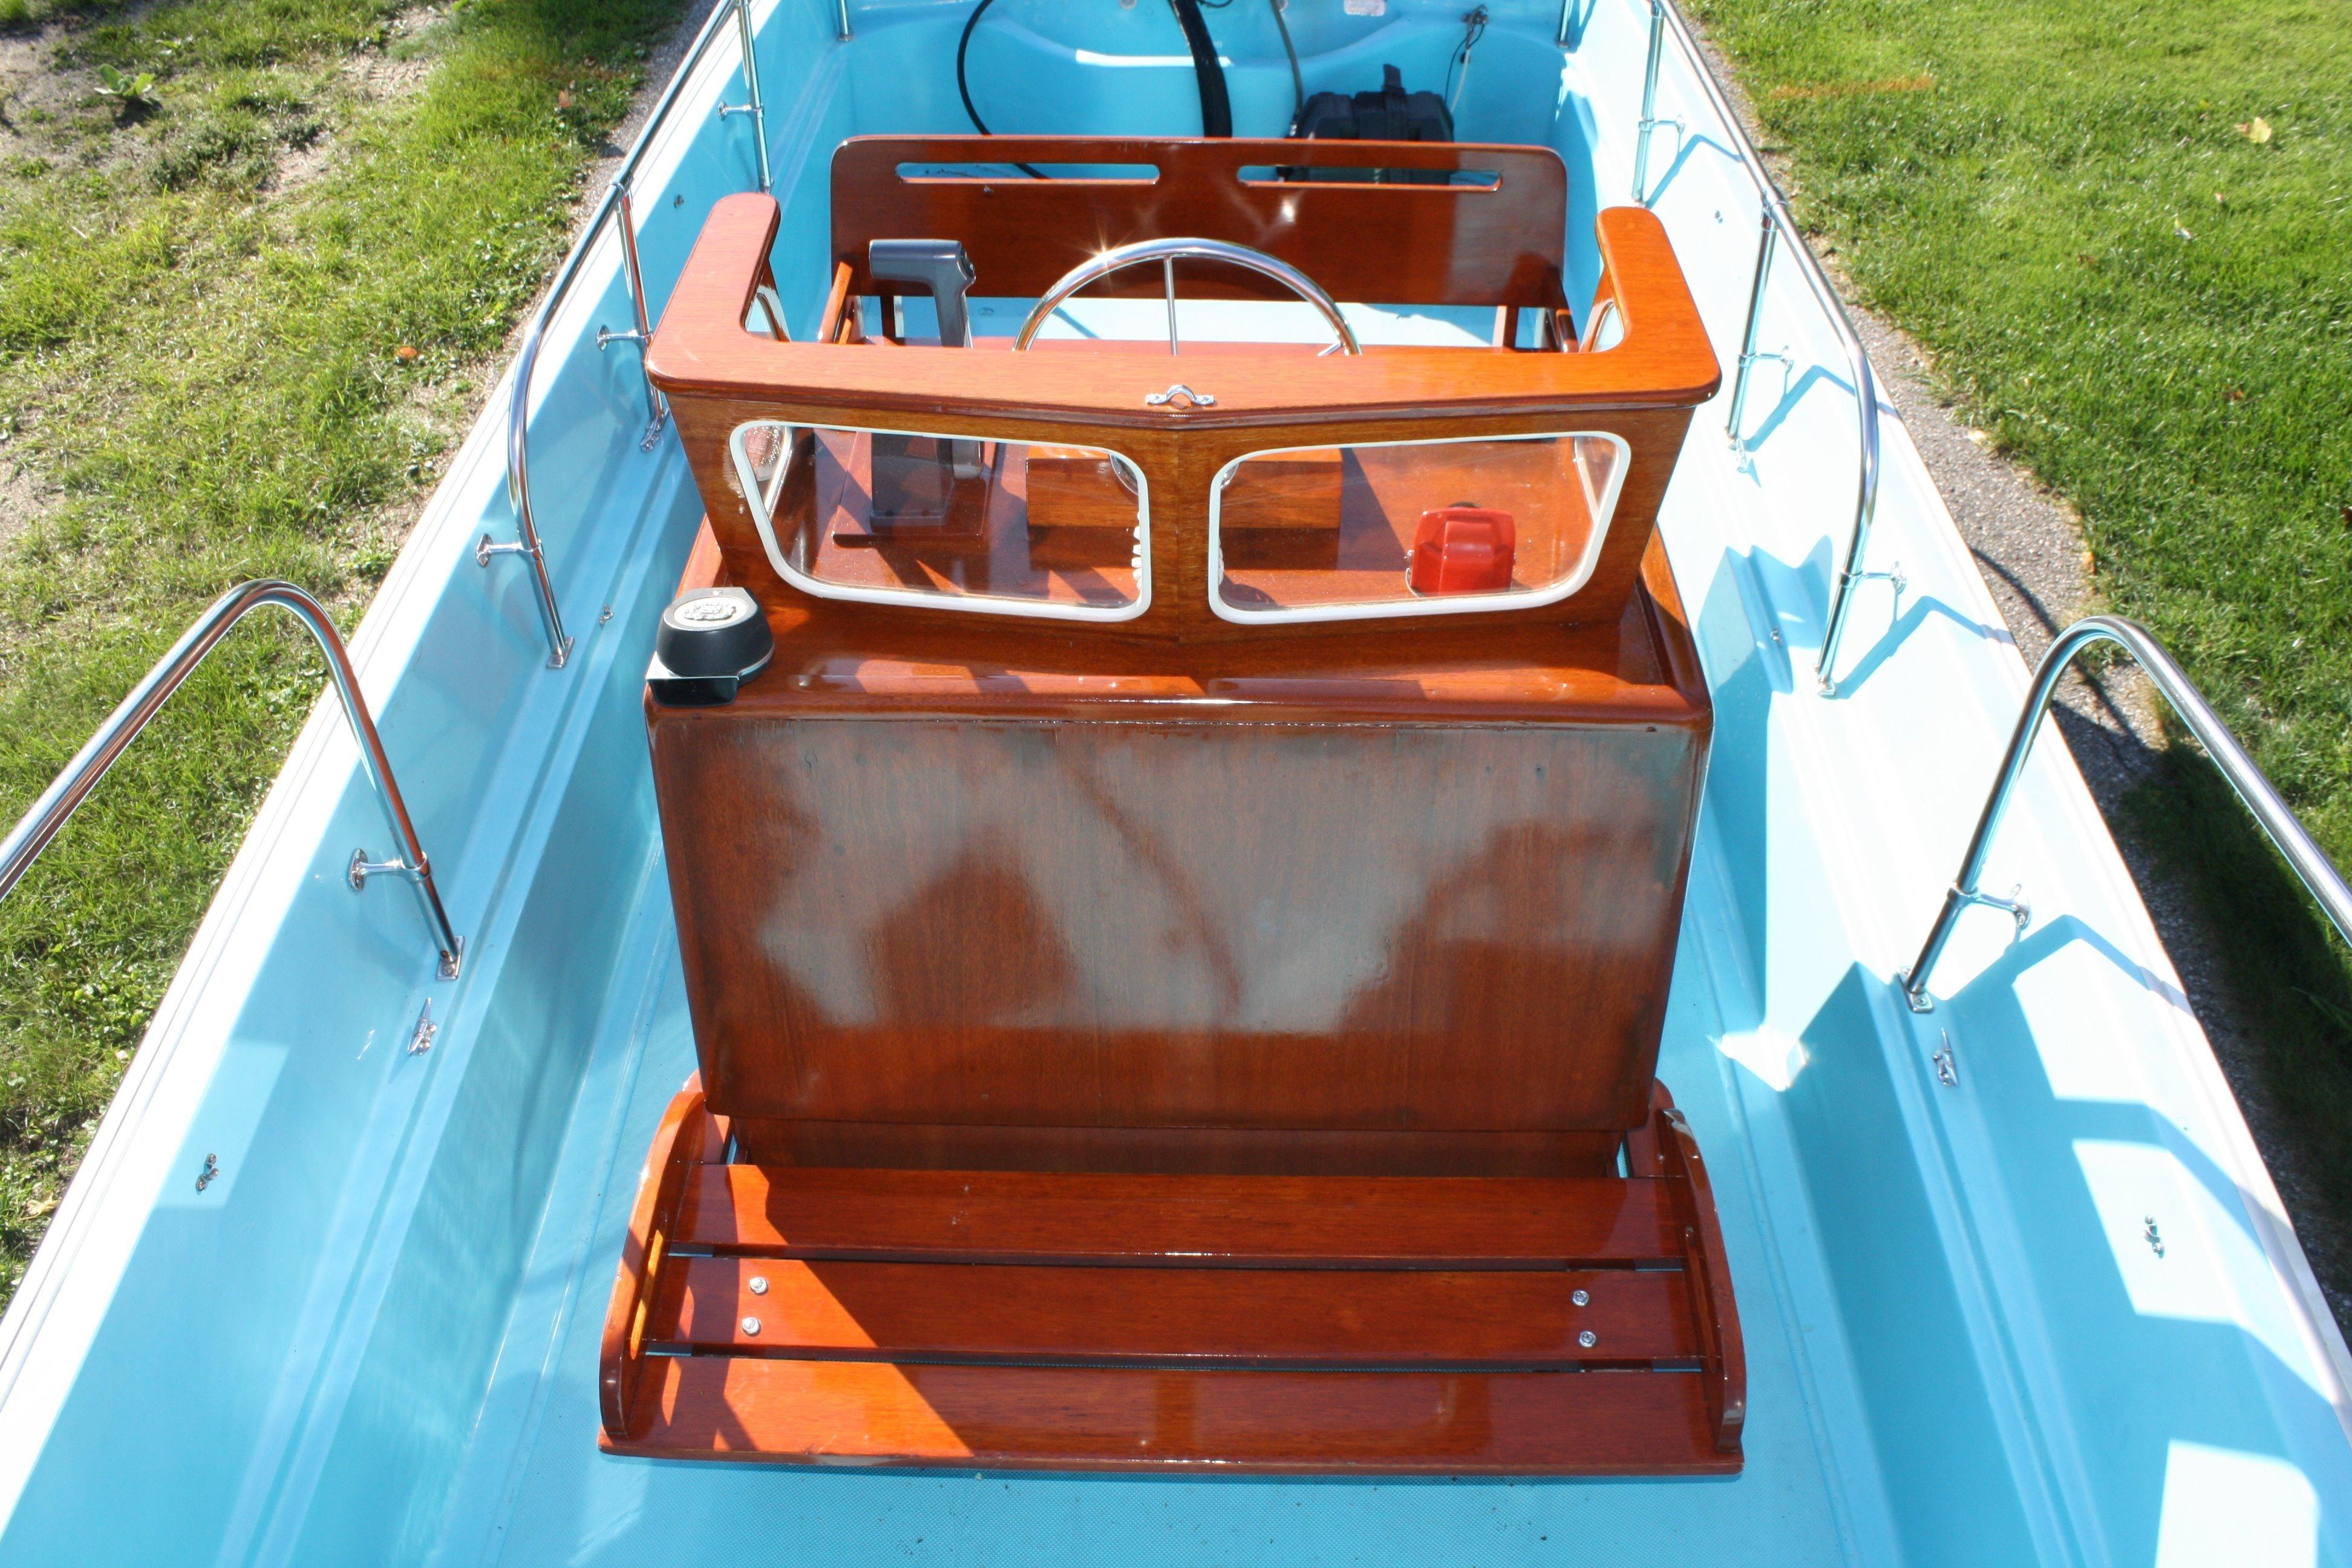 1971 Boston Whaler 17 Nauset for sale | Old Boston Whalers